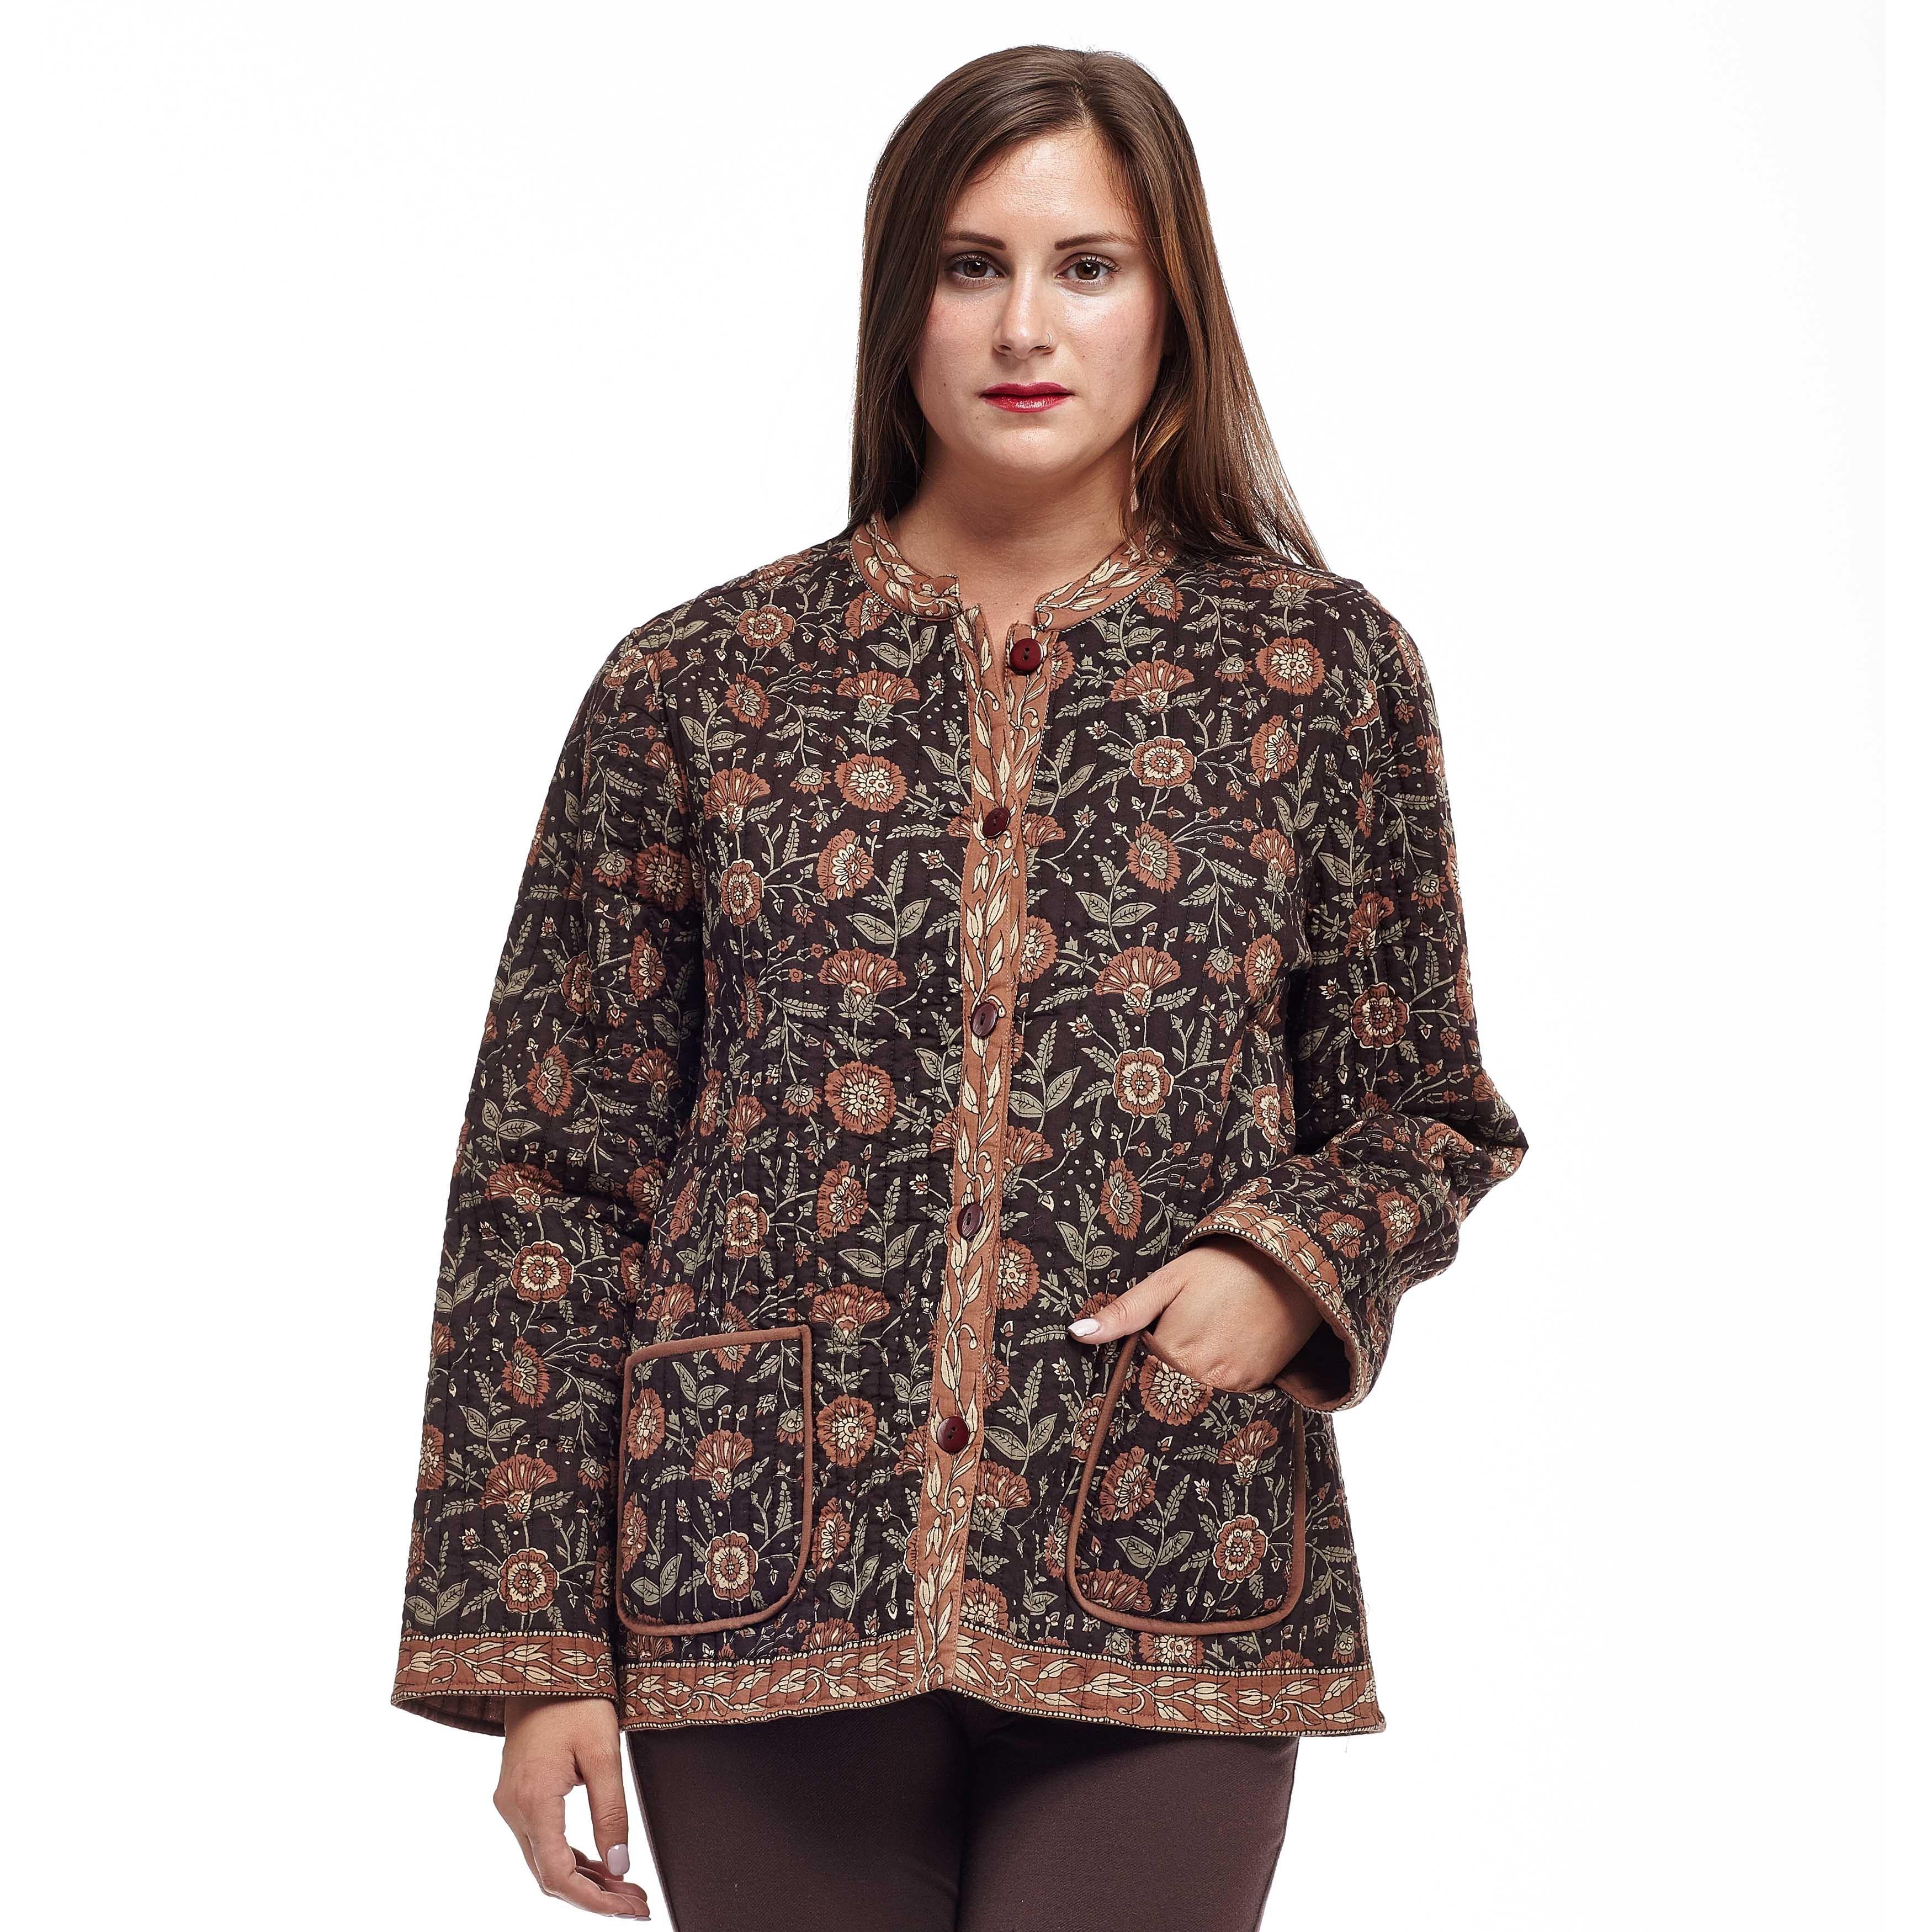 4b72e2298d1 Shop La Cera Women s Plus Size Quilted Mandarin Collar Jacket - Ships To  Canada - - 8914820